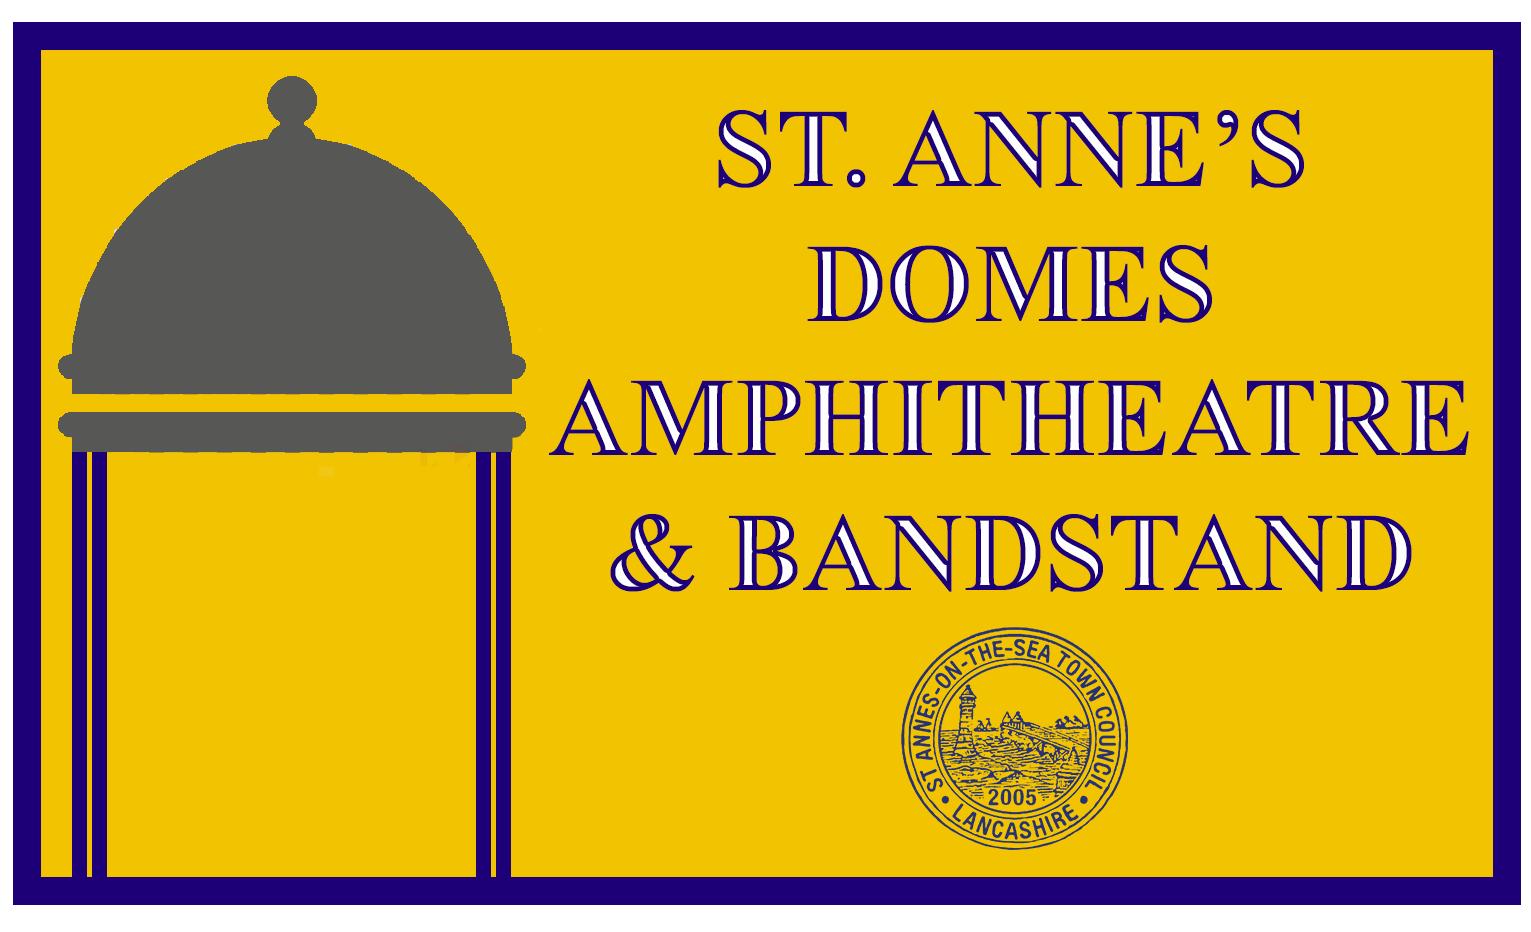 St Annes Domes logo